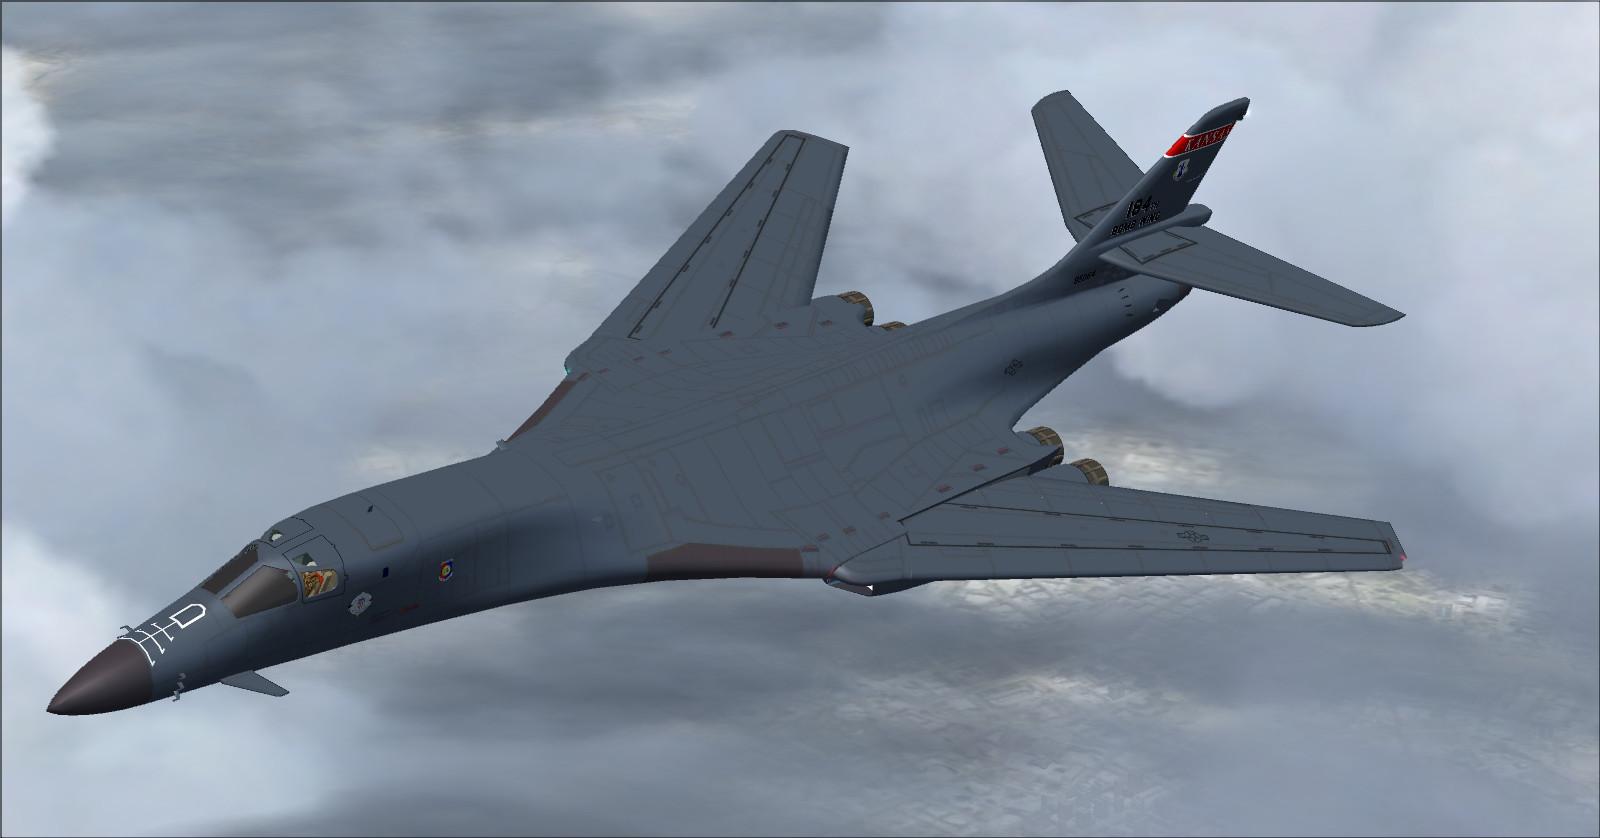 The Brick Brothers: B-1B Lancer Paper Airplane B1 Lancer Supersonic